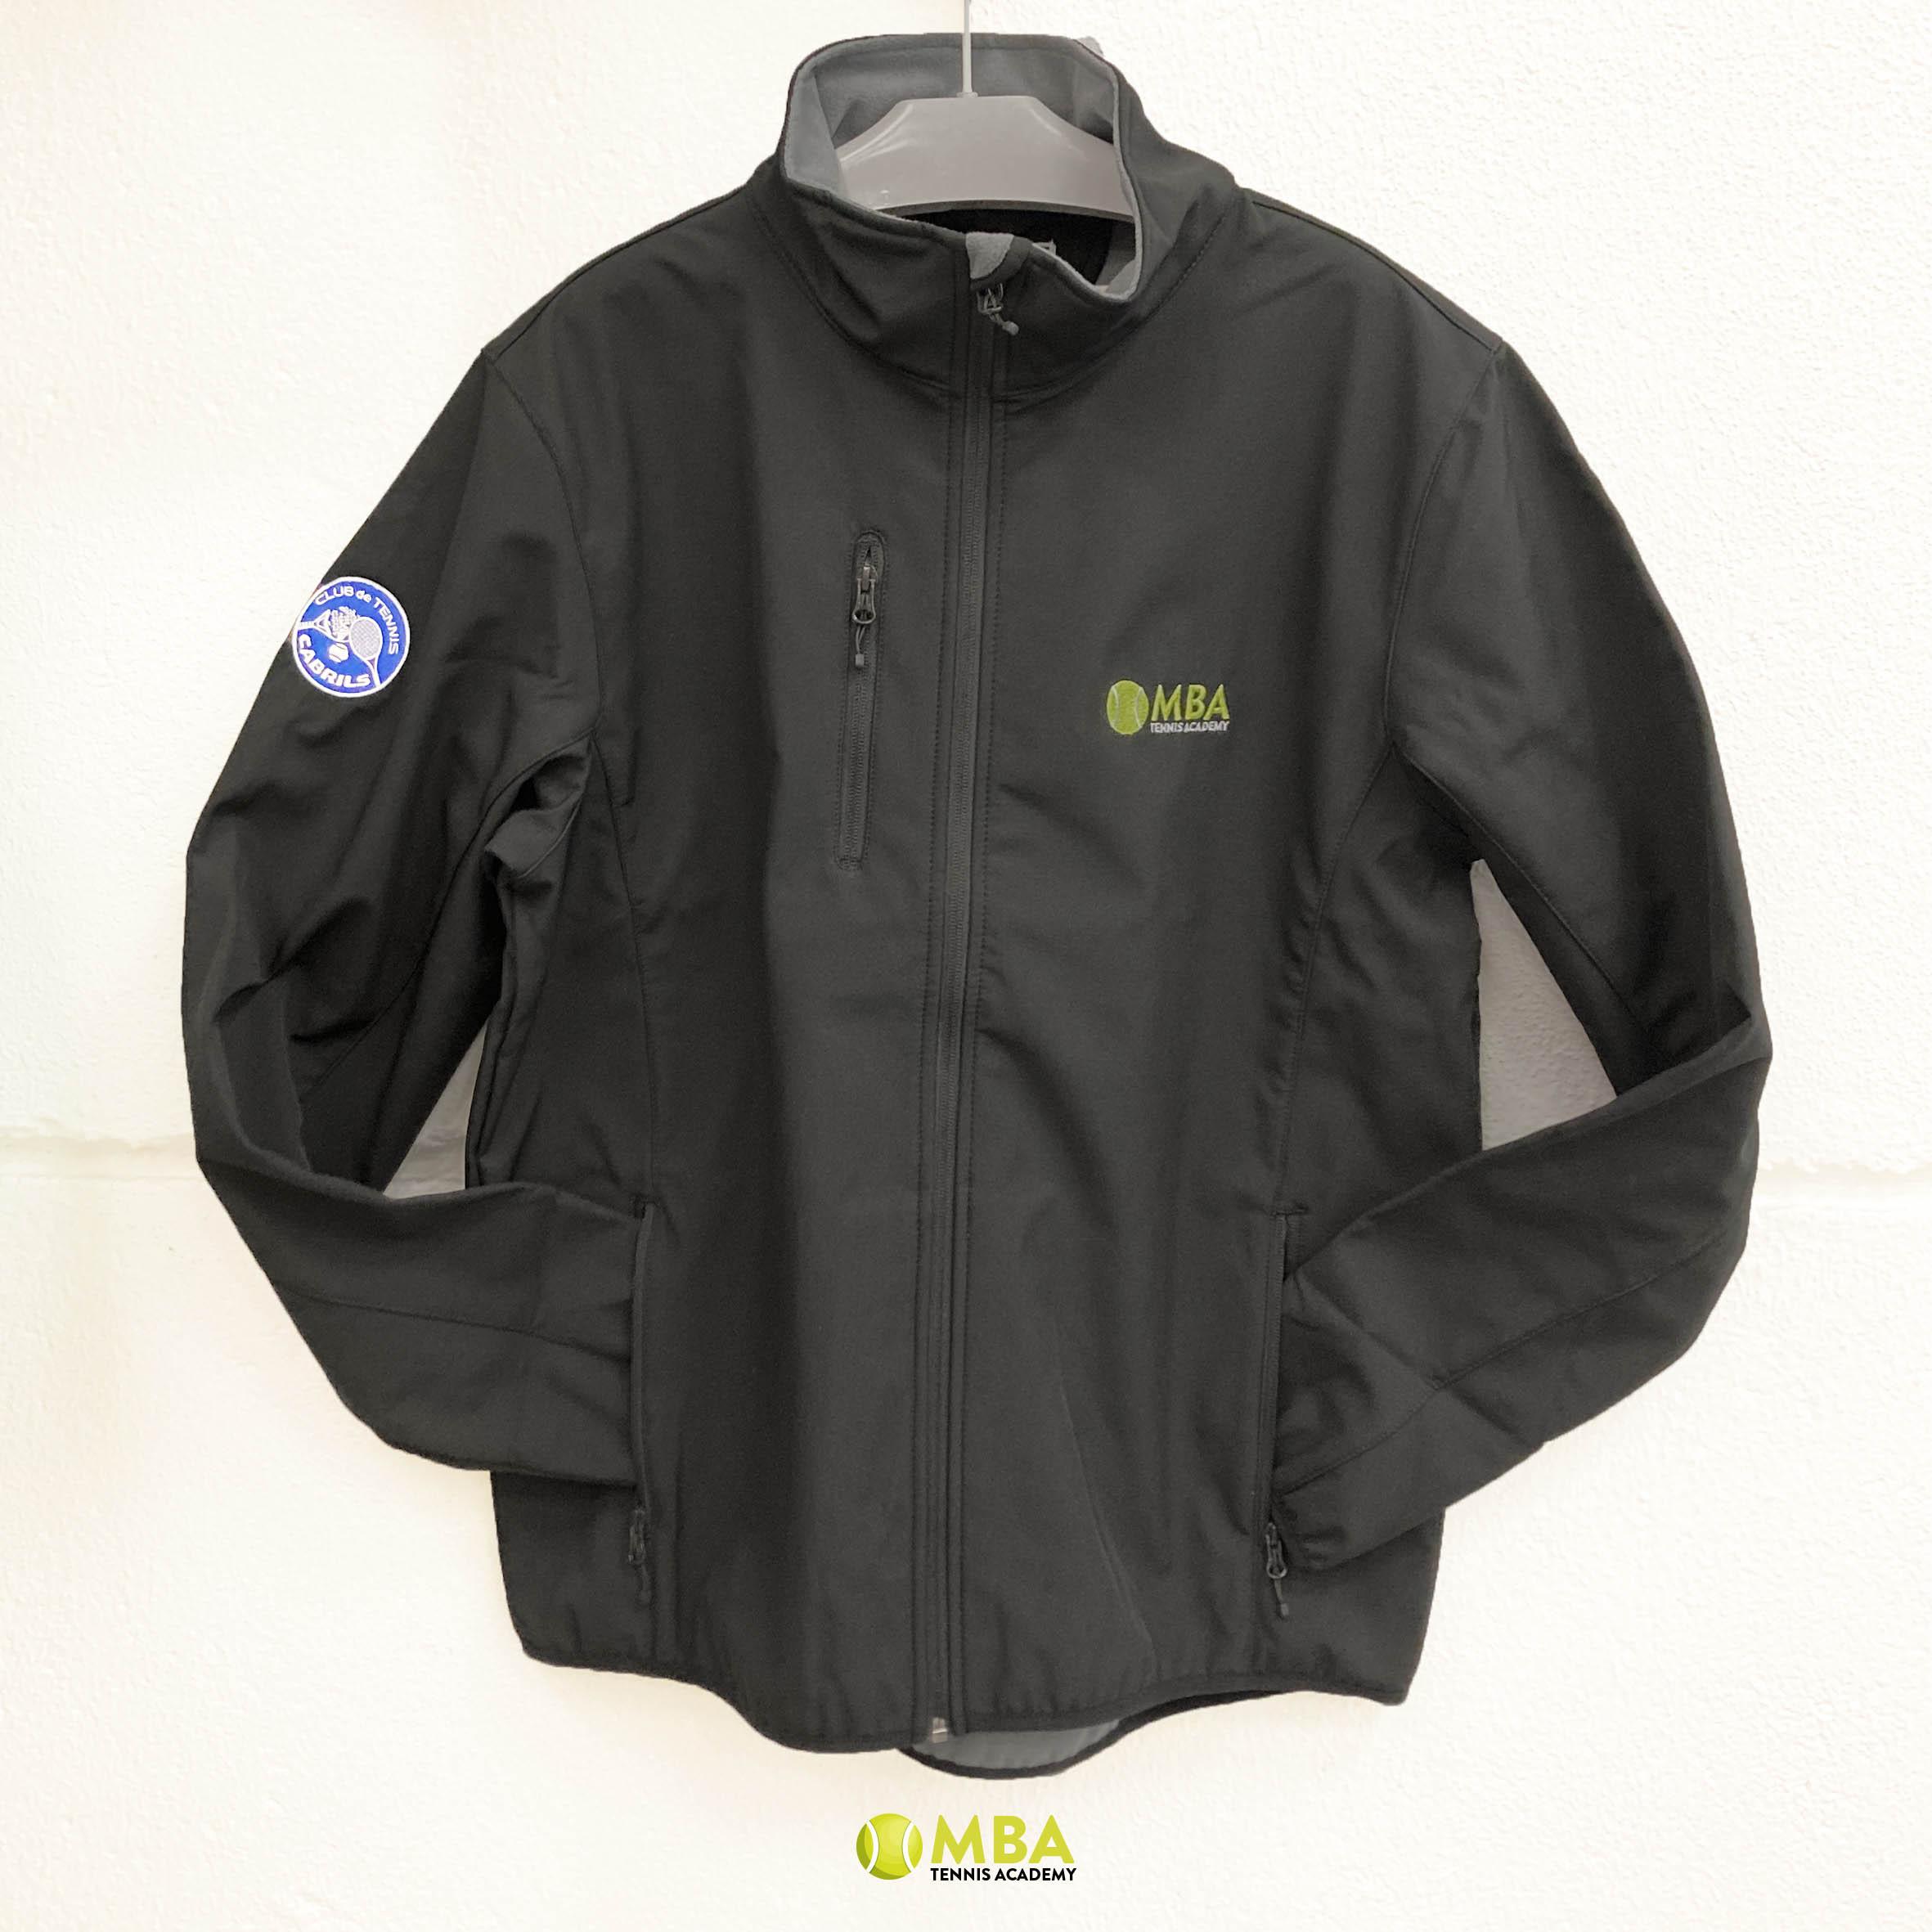 MBA-Tennis-Academy-chaqueta-softshell-1